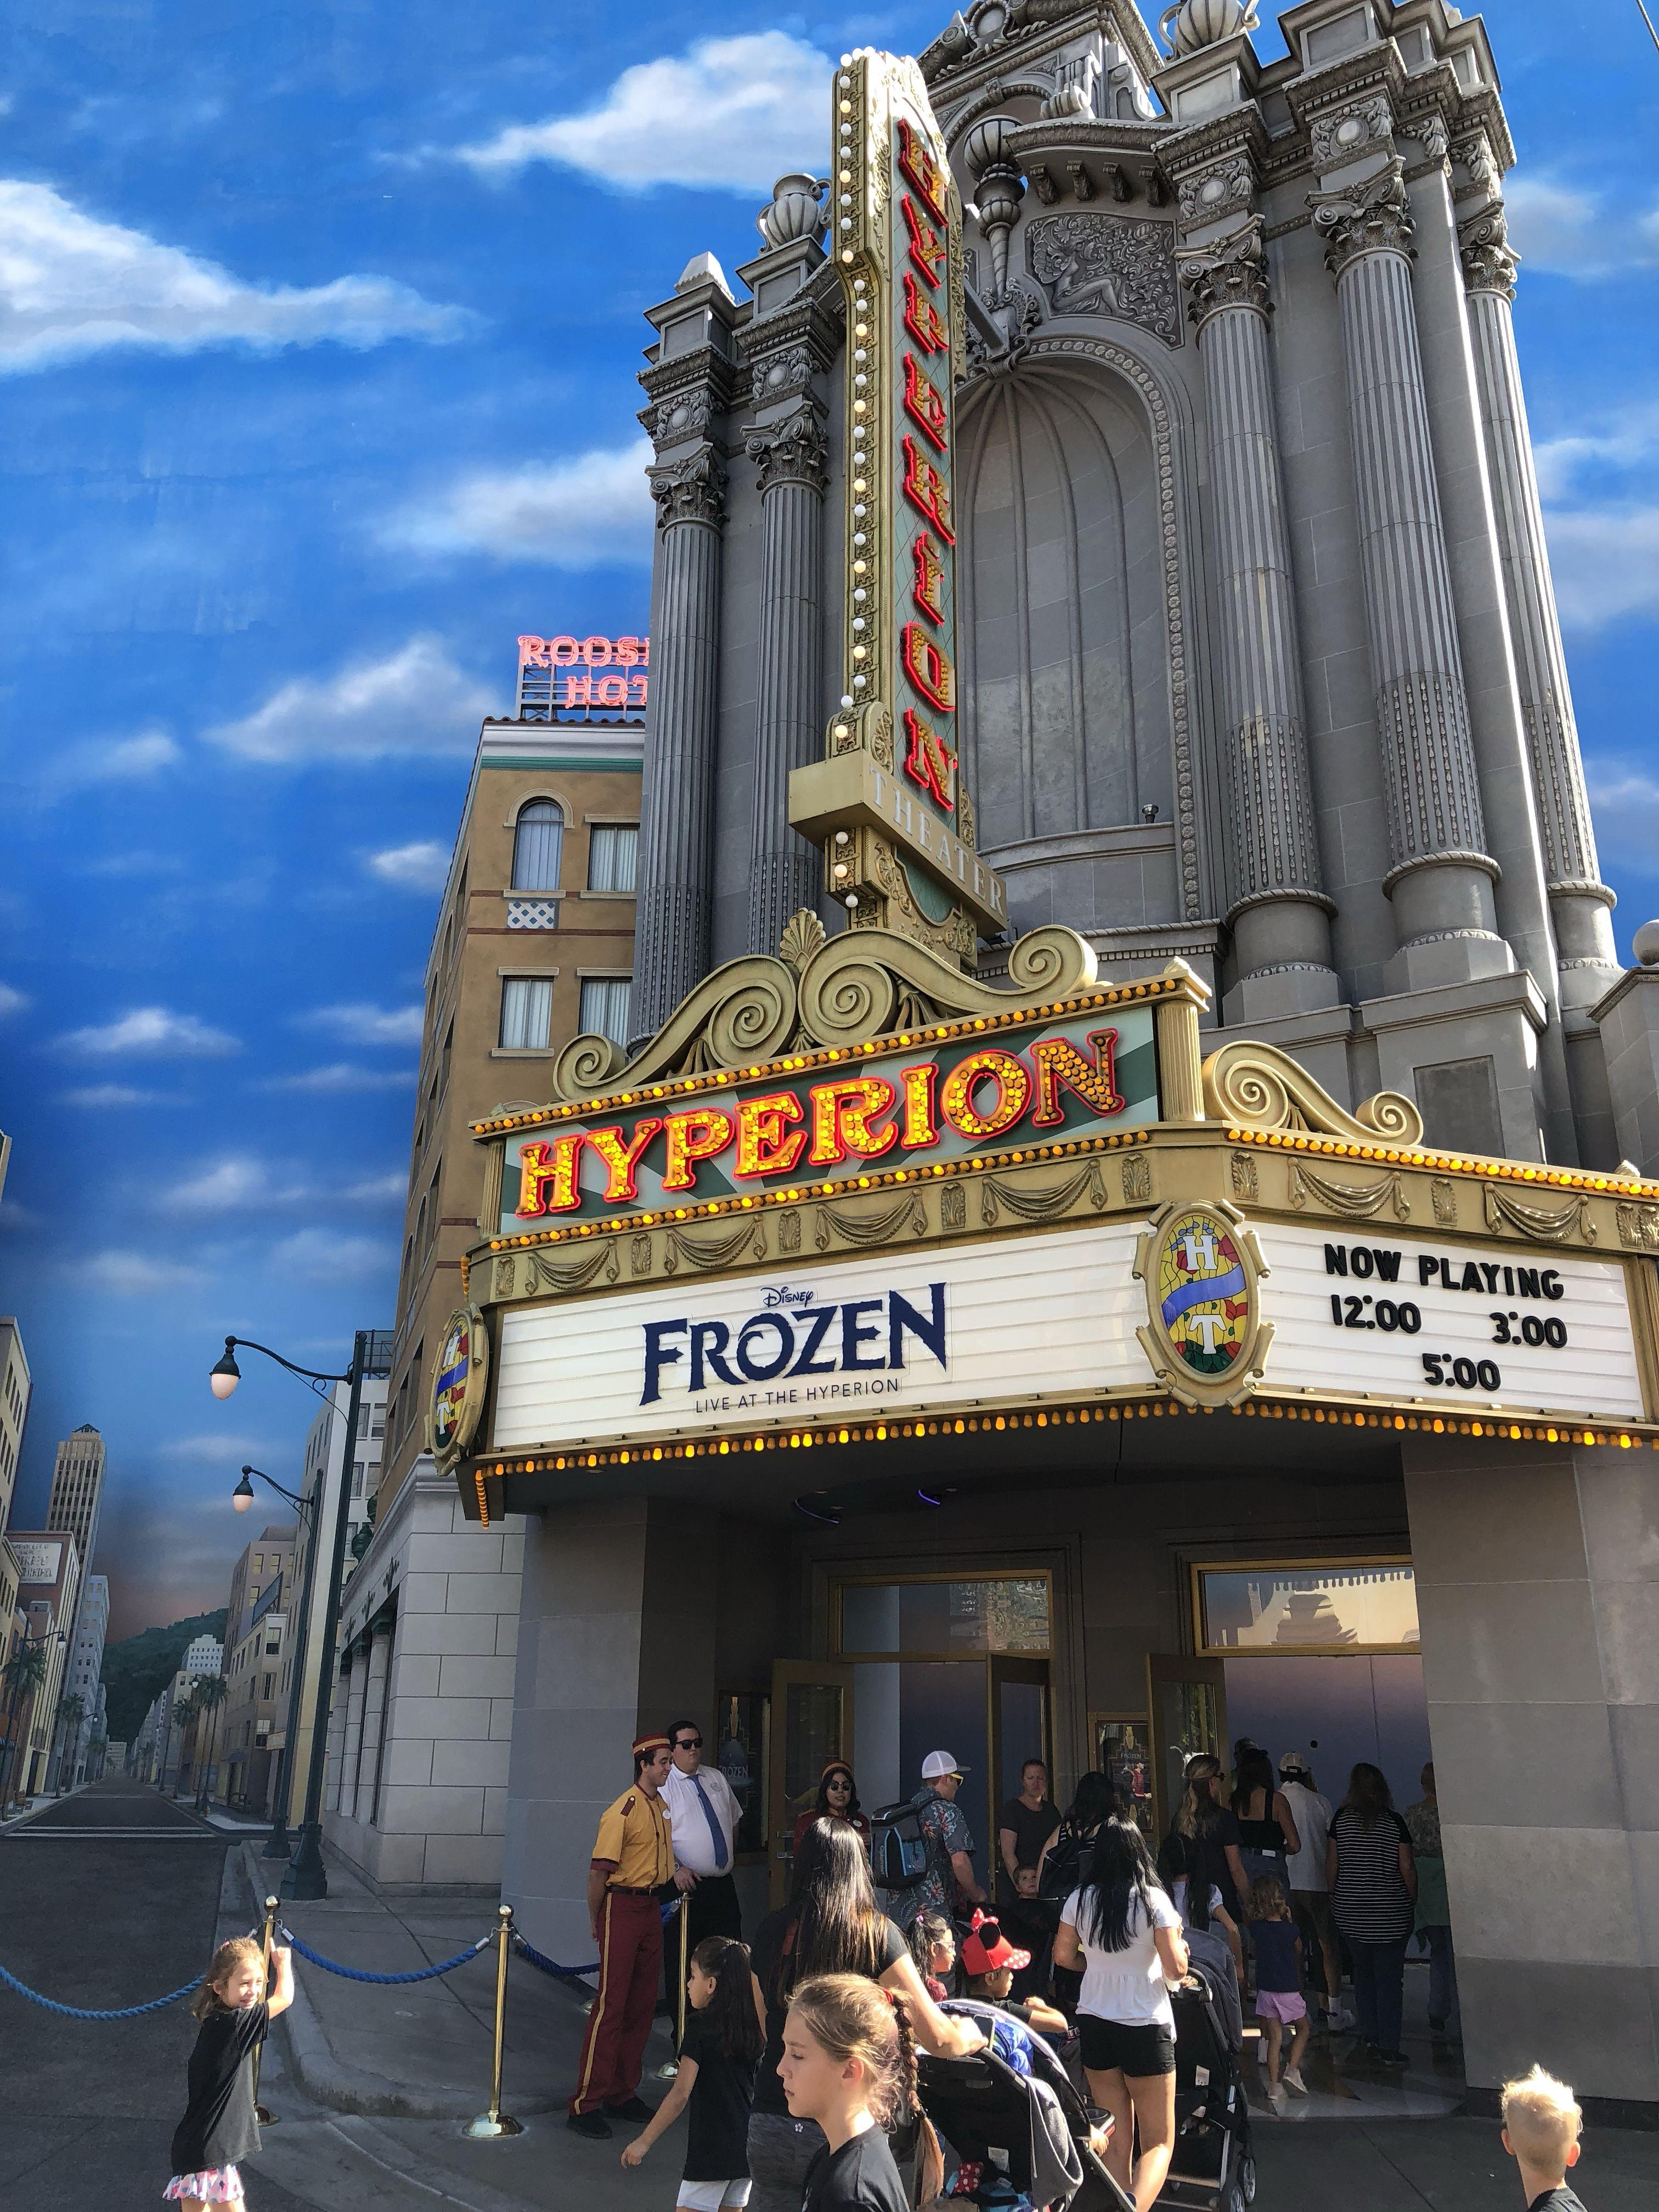 Hyperion theater at disneys california adventure frozen